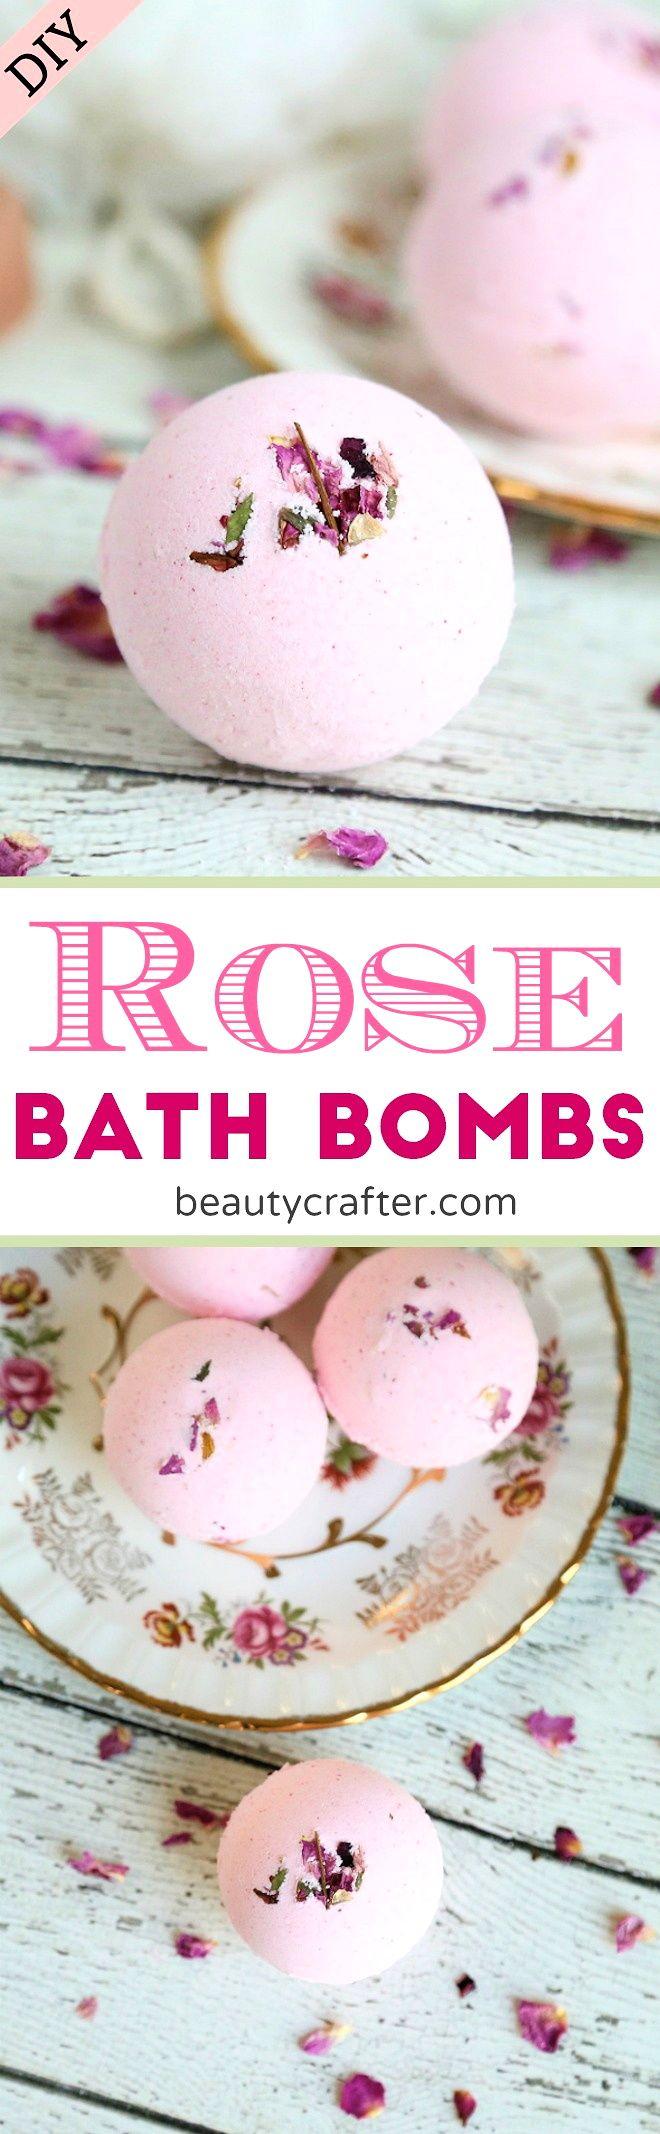 DIY Rose Bath Bombs recipe #bathbombs #rose #roses  #valentinesday via @beautycrafts